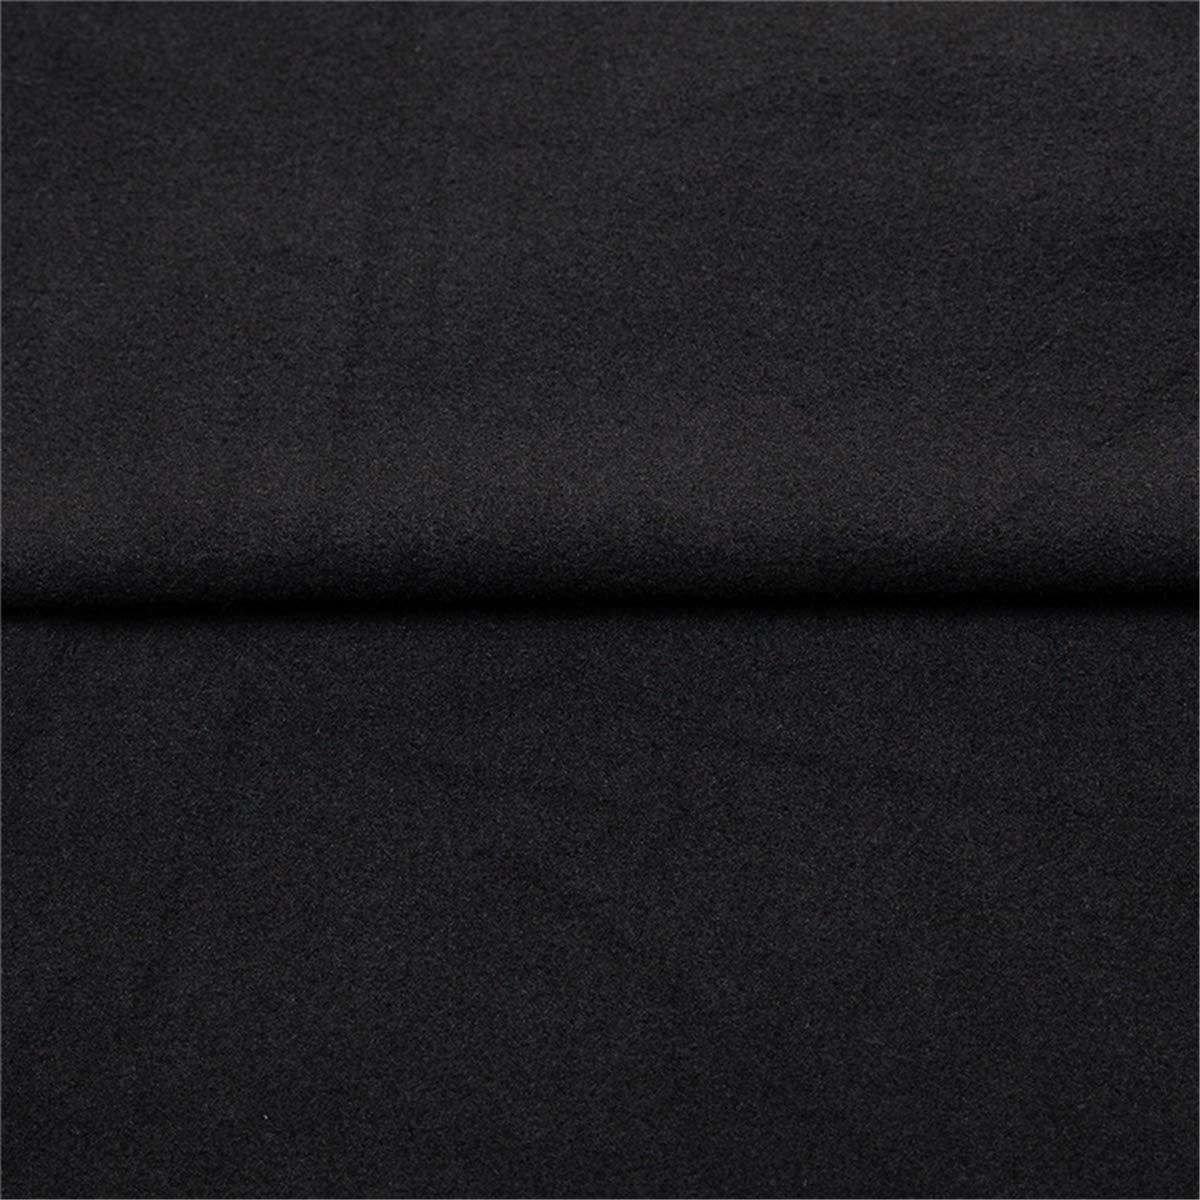 Apparelsales Mens Warm Winter Fleece Thermal Jersey Legging Pants Tights Base Layer Underwear Set